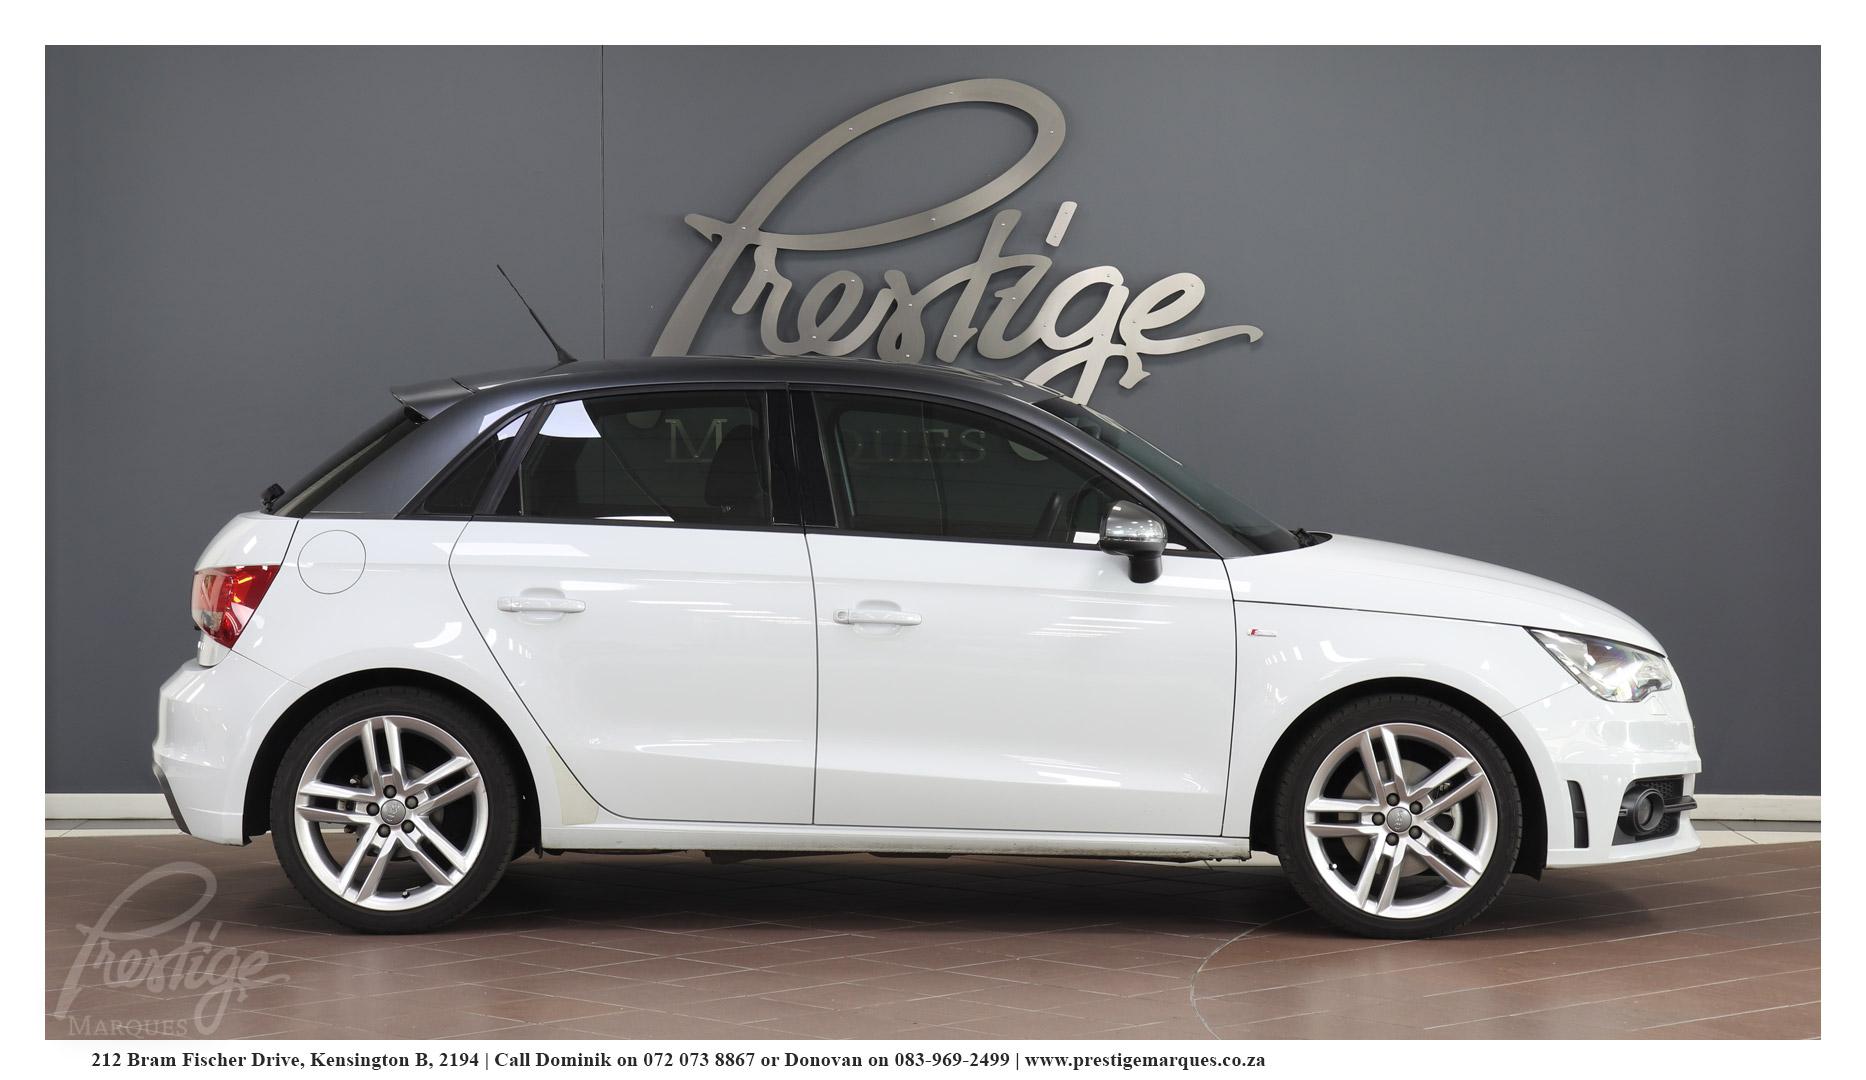 2012-Audi-A1-TFsi-STronic-Sline-Sportbackl-Prestige-Marques-Randburg-Sandton-3